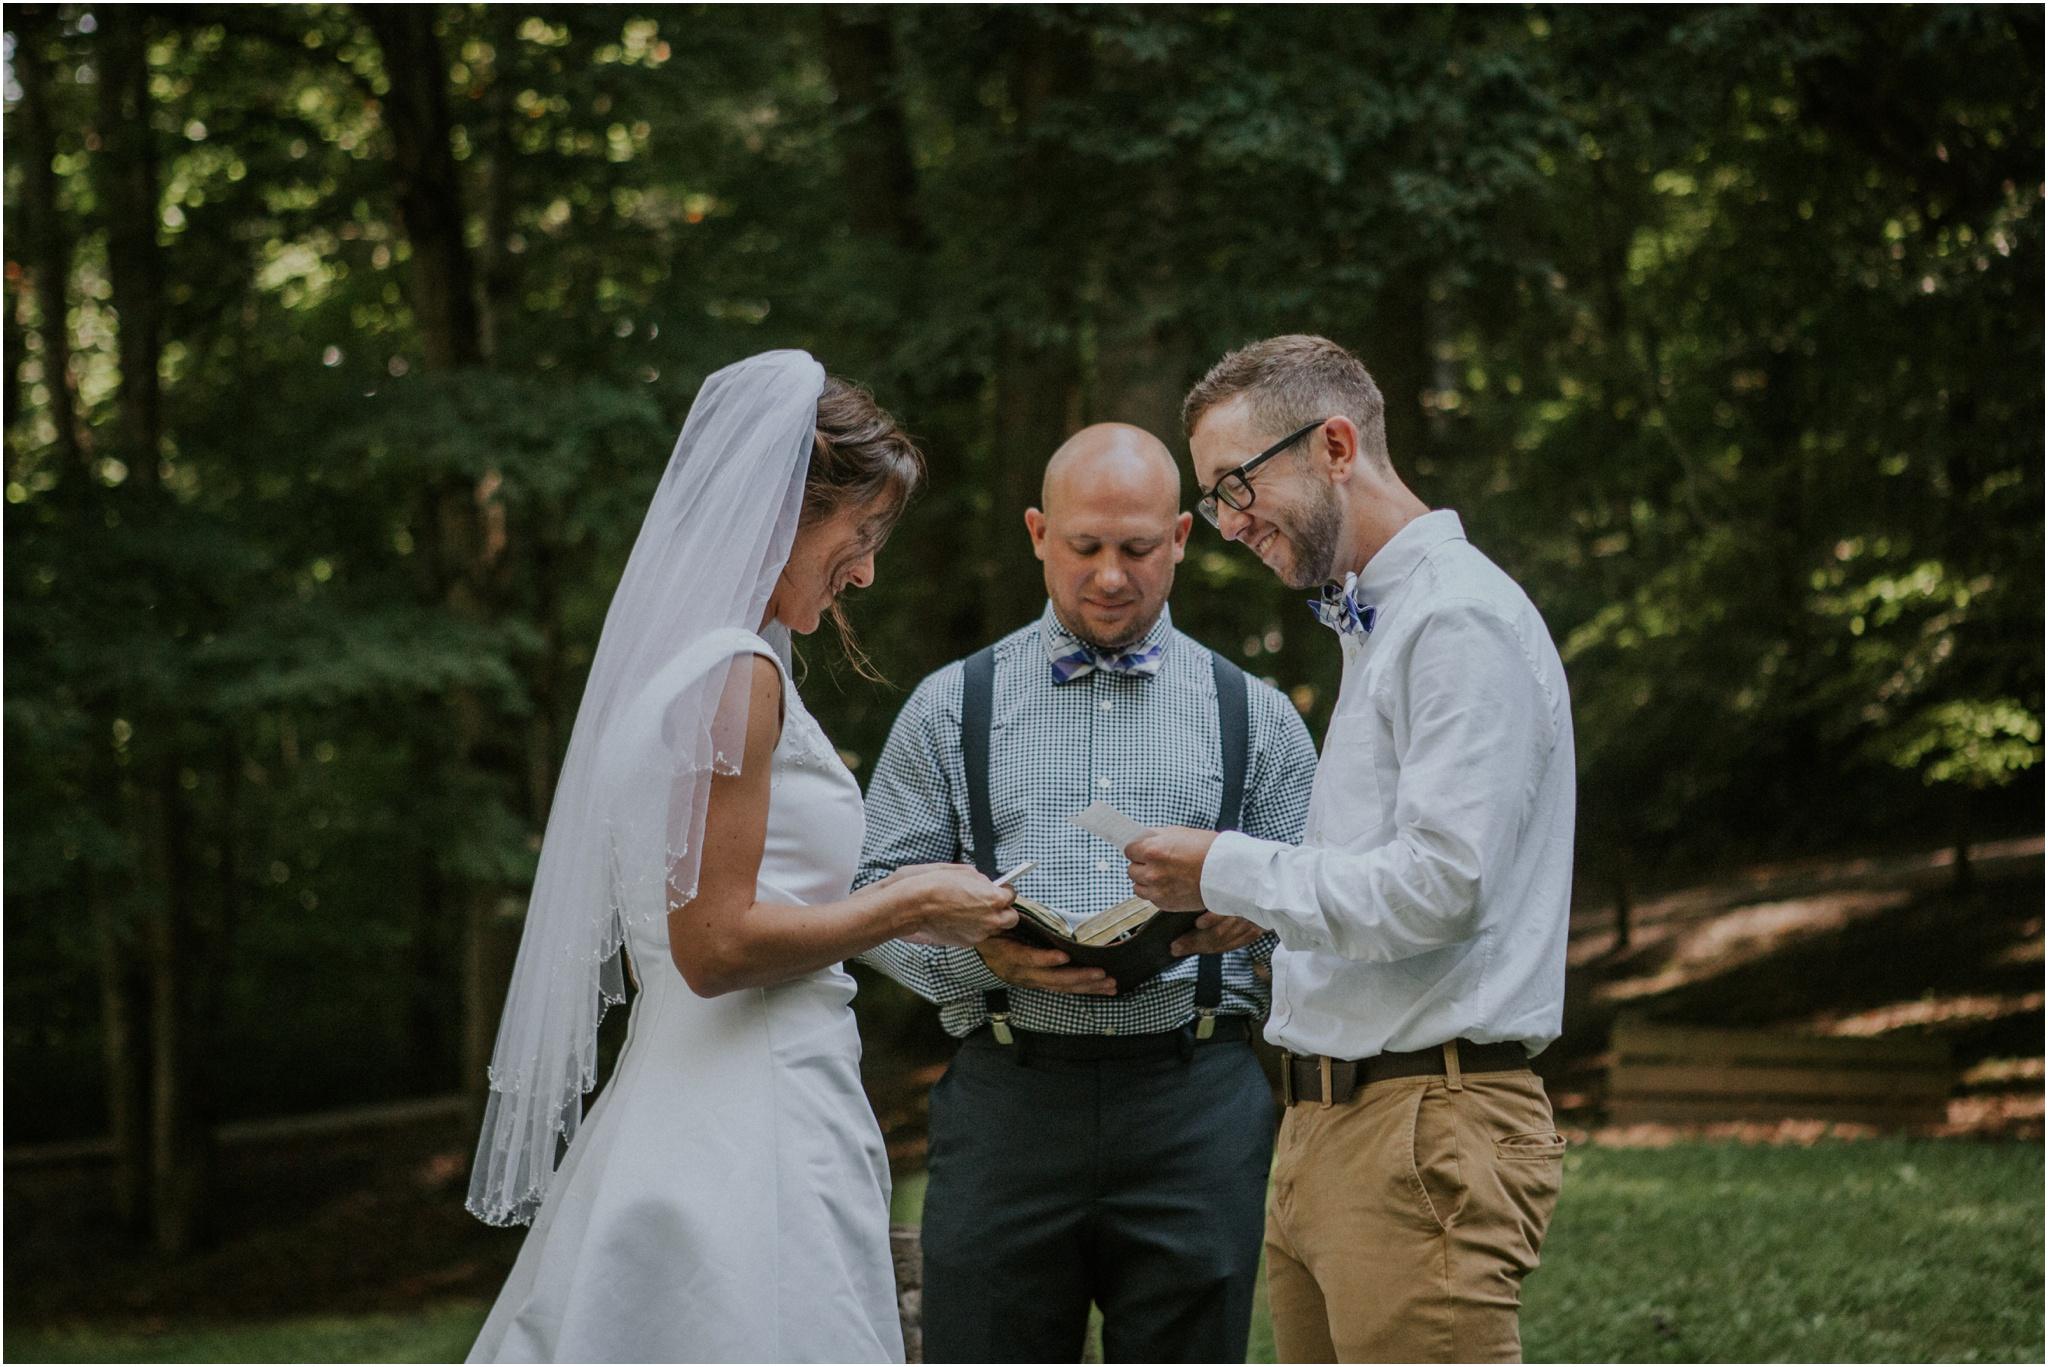 sugar-hollow-park-bristol-virginia-wedding-intimate-woodsy-black-forest-ceremony-adventurous-couple_0025.jpg